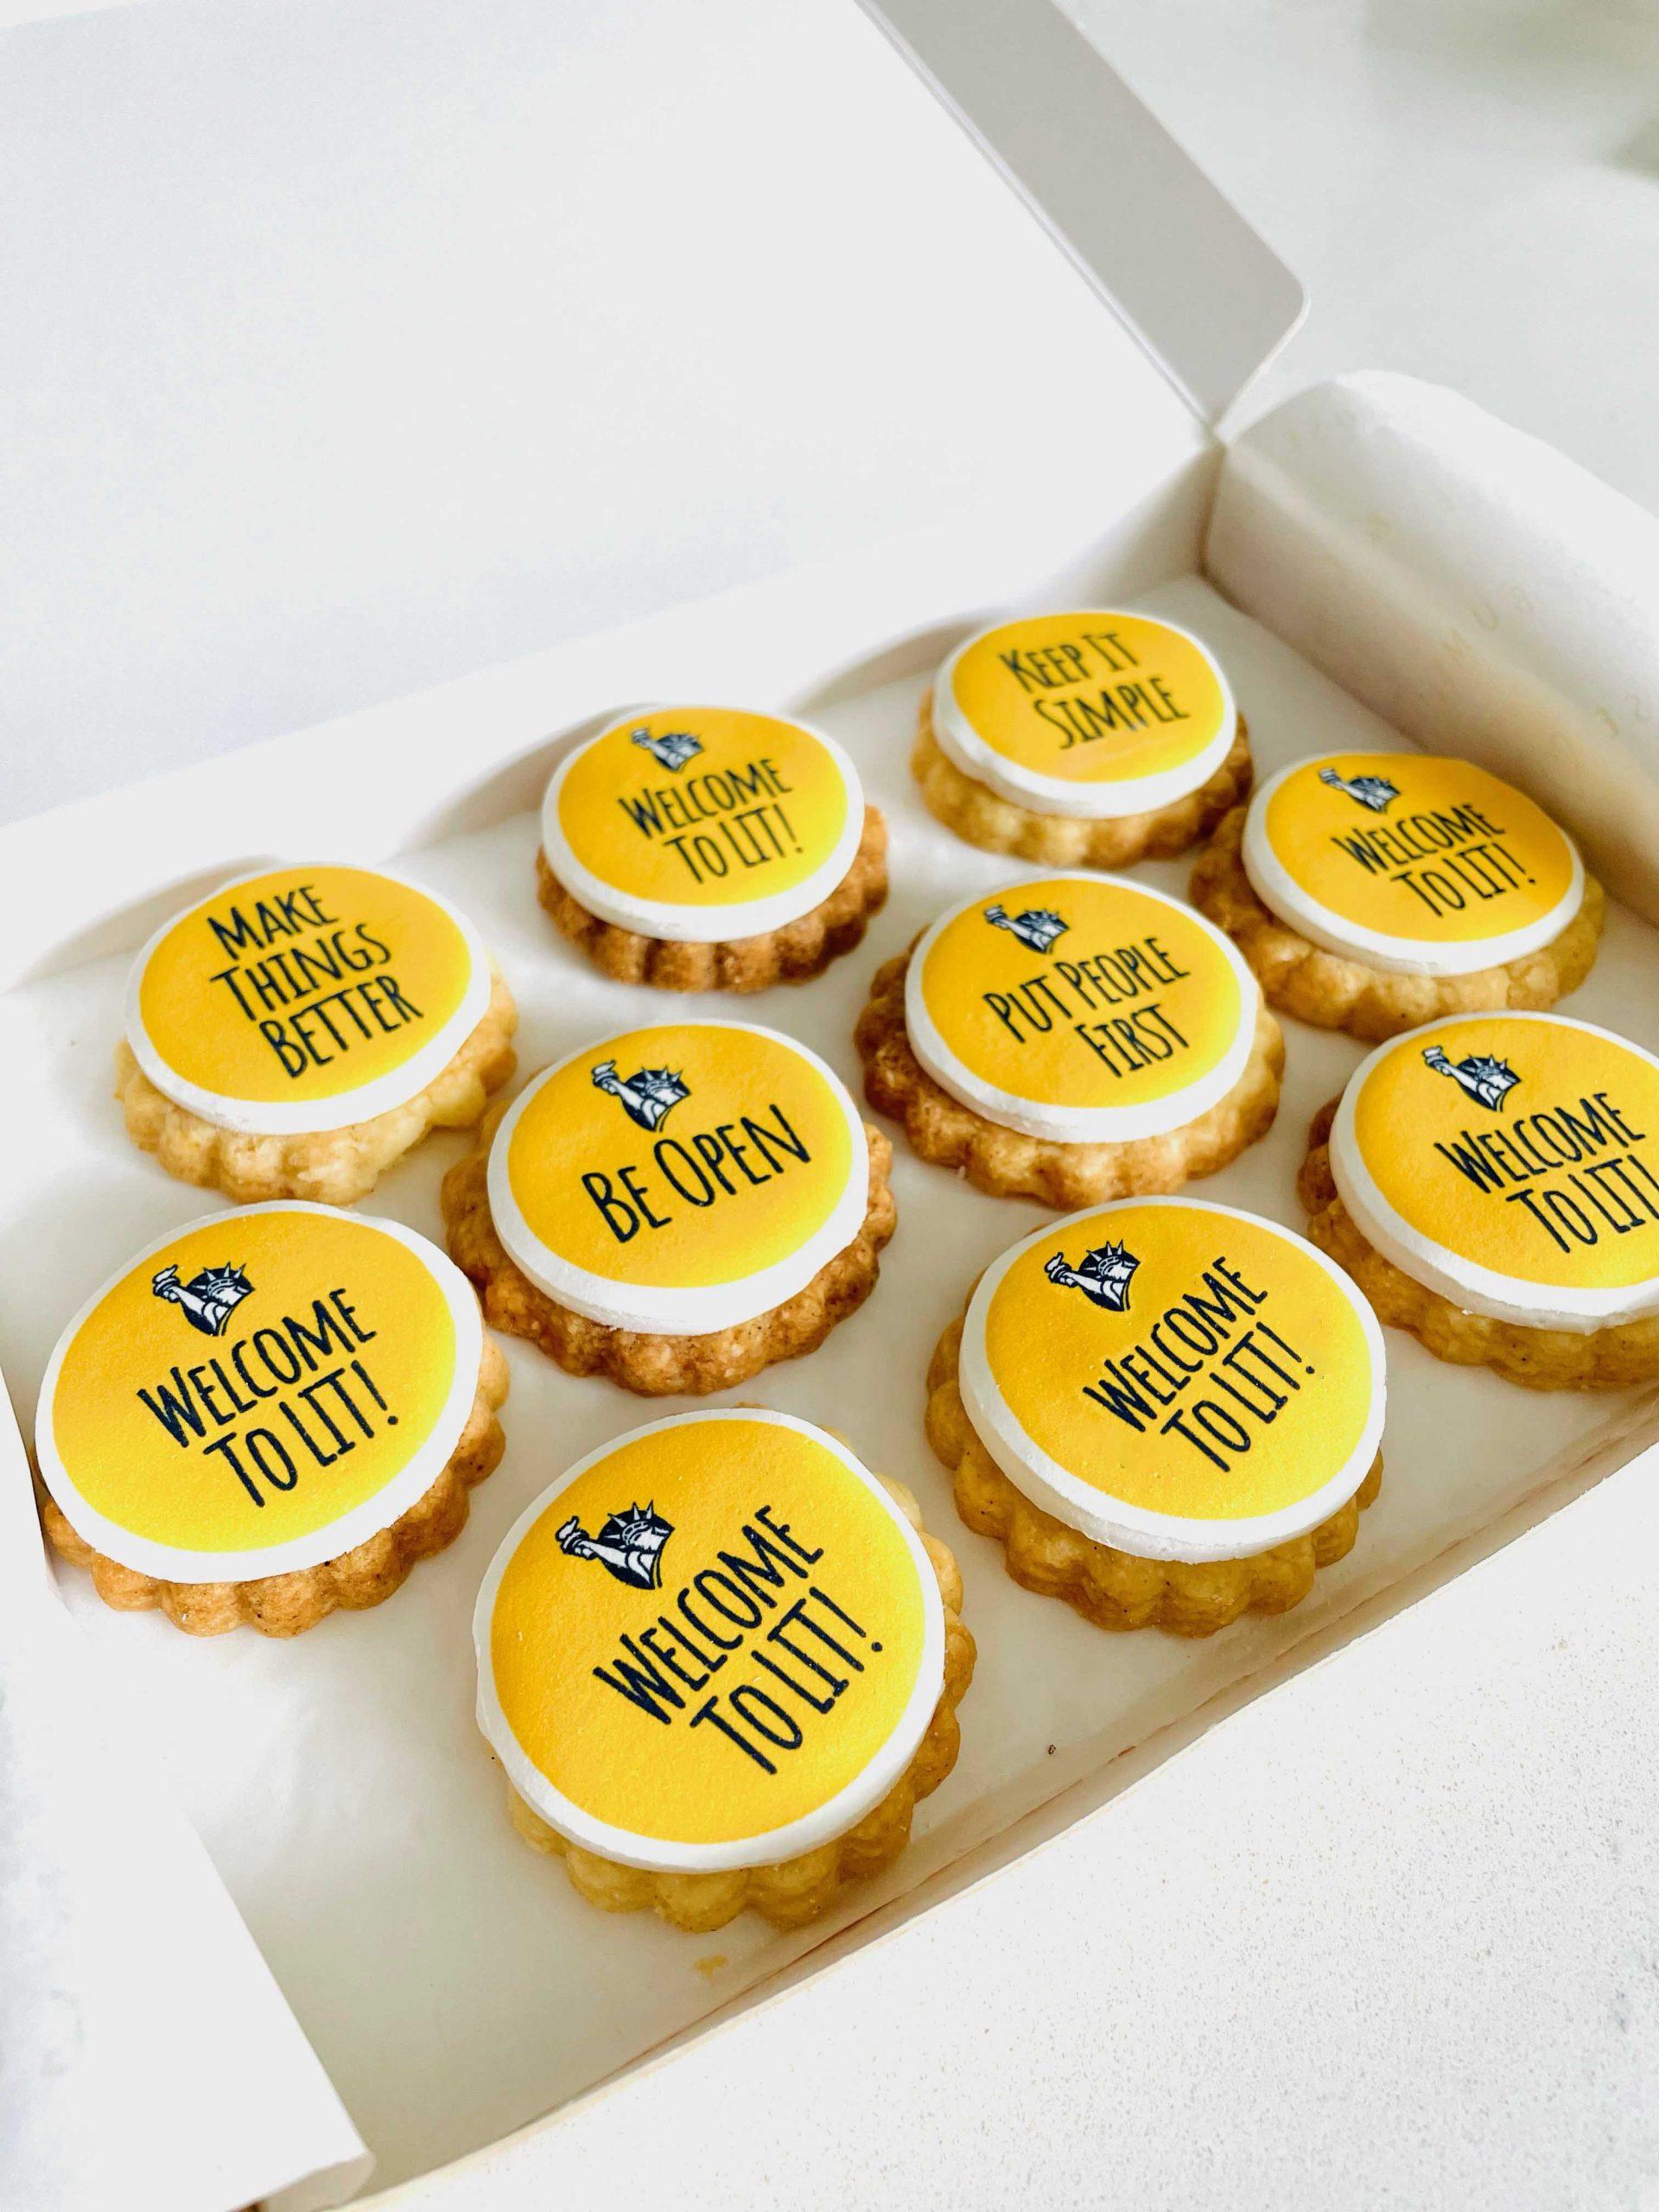 Custom Personalised Biscuits